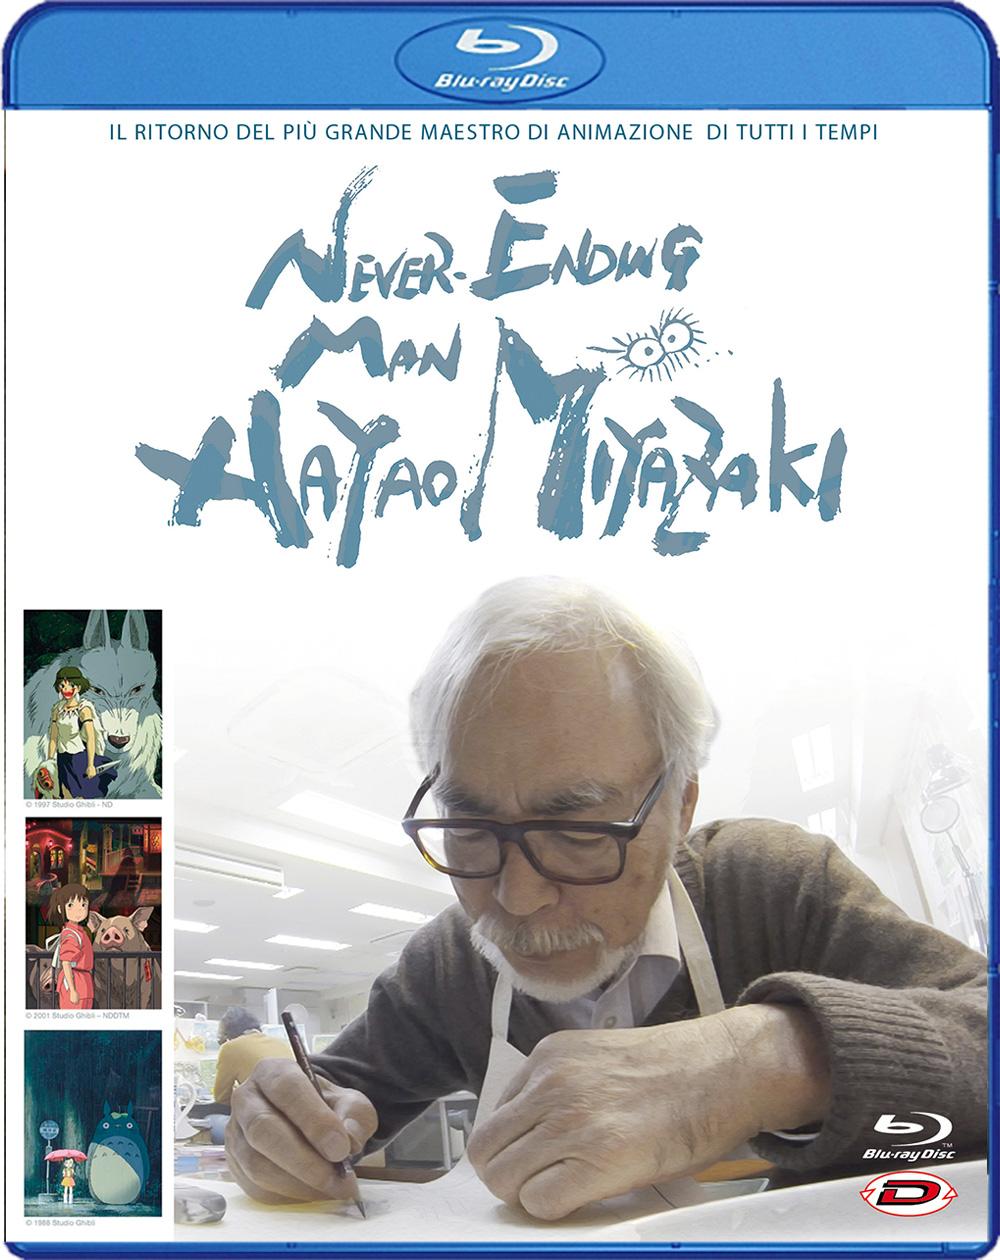 NEVER-ENDING MAN: HAYAO MIYAZAKI - BLU RAY